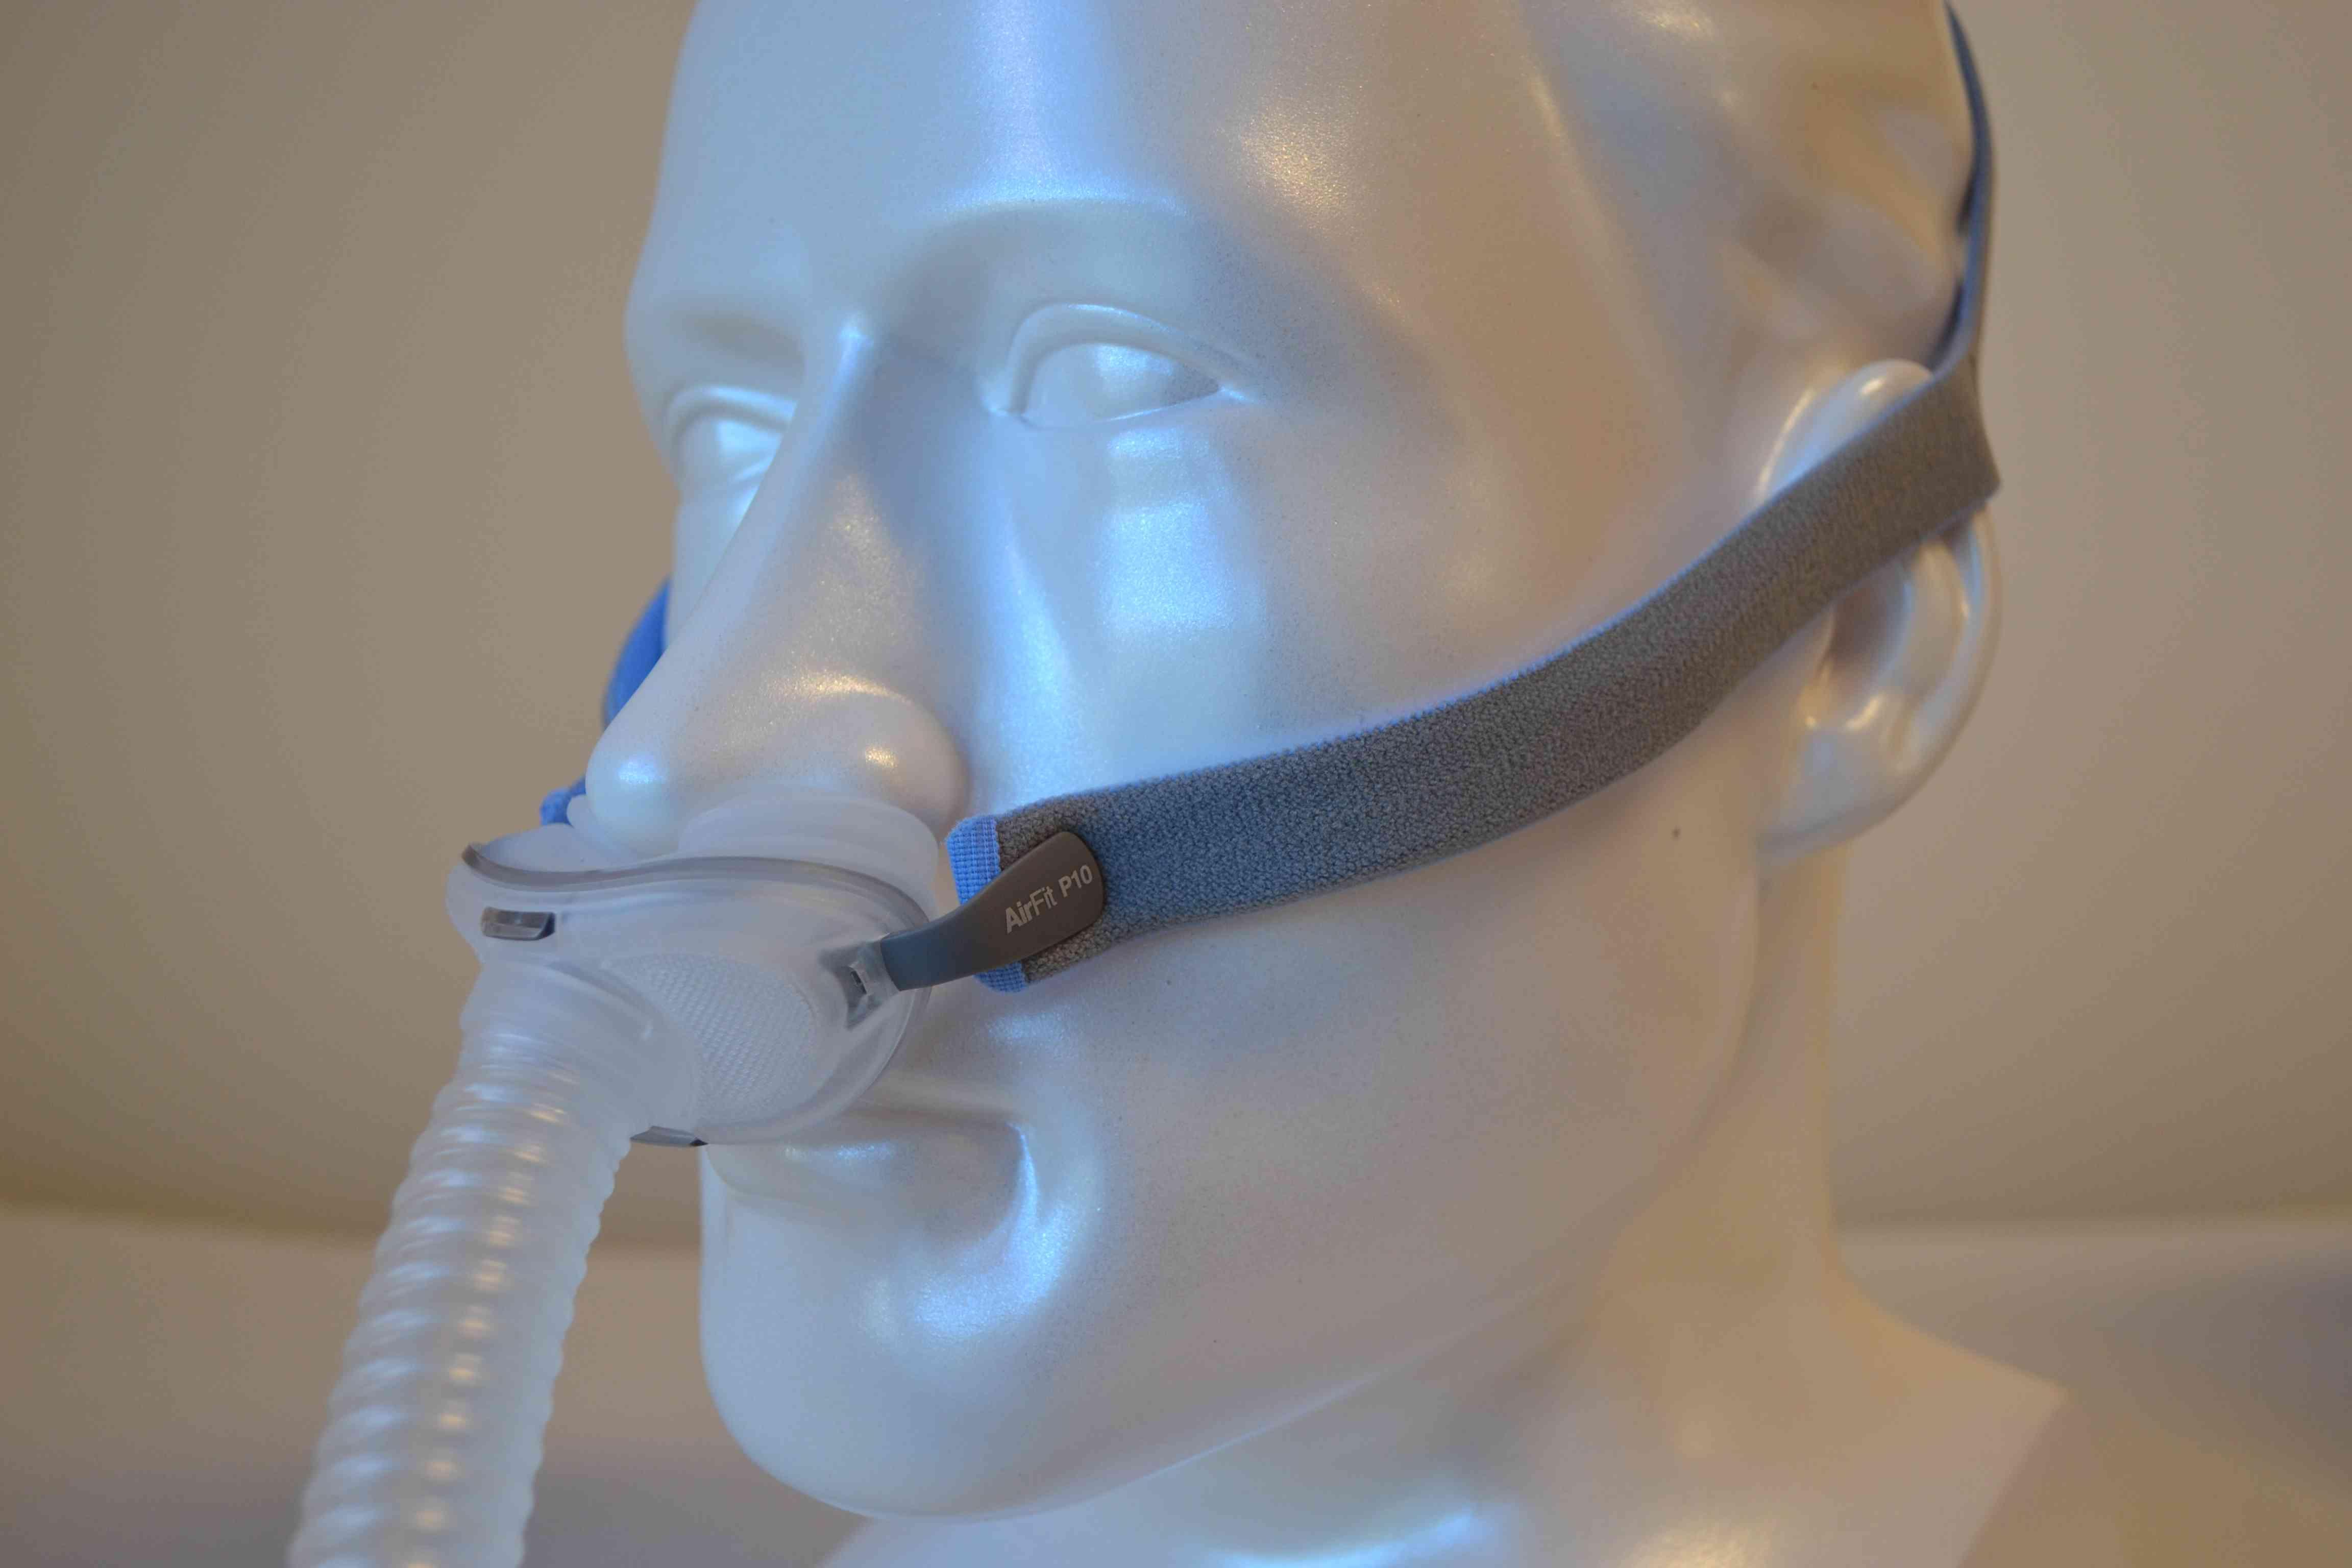 resmed airfit p10 nasal pillows cpap mask